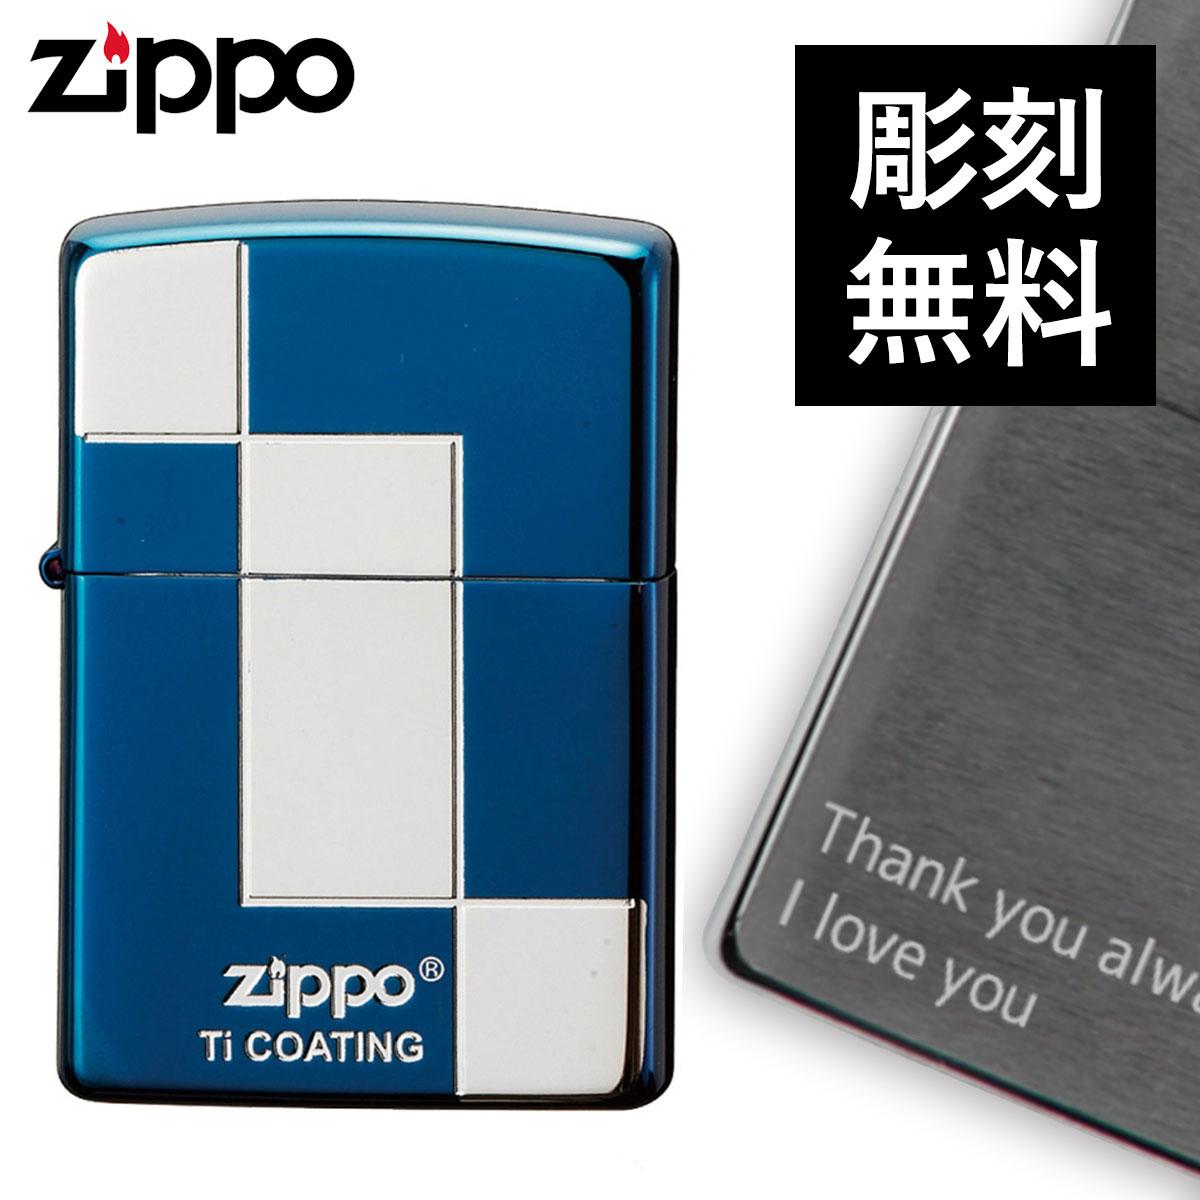 zippo 名入れ ジッポー ライター チタン キズがつきにくい TNB 11 名入れ ギフト オイルライター ジッポライター ギフト プレゼント 彼氏 男性 メンズ